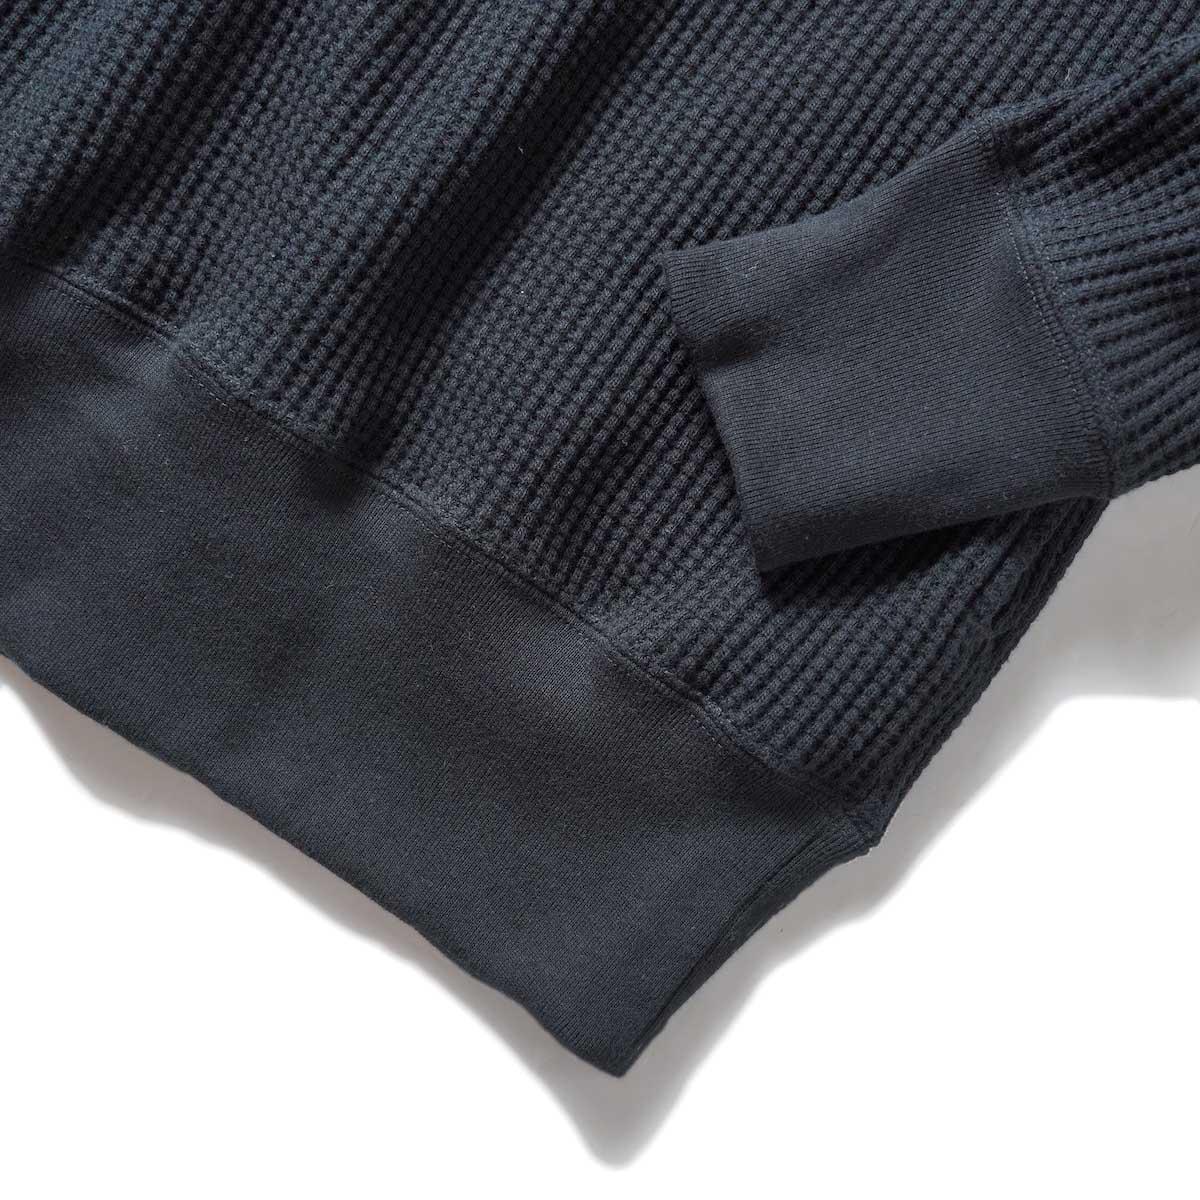 SOIL / TURTLE NECK L/SL (Black) 袖・裾